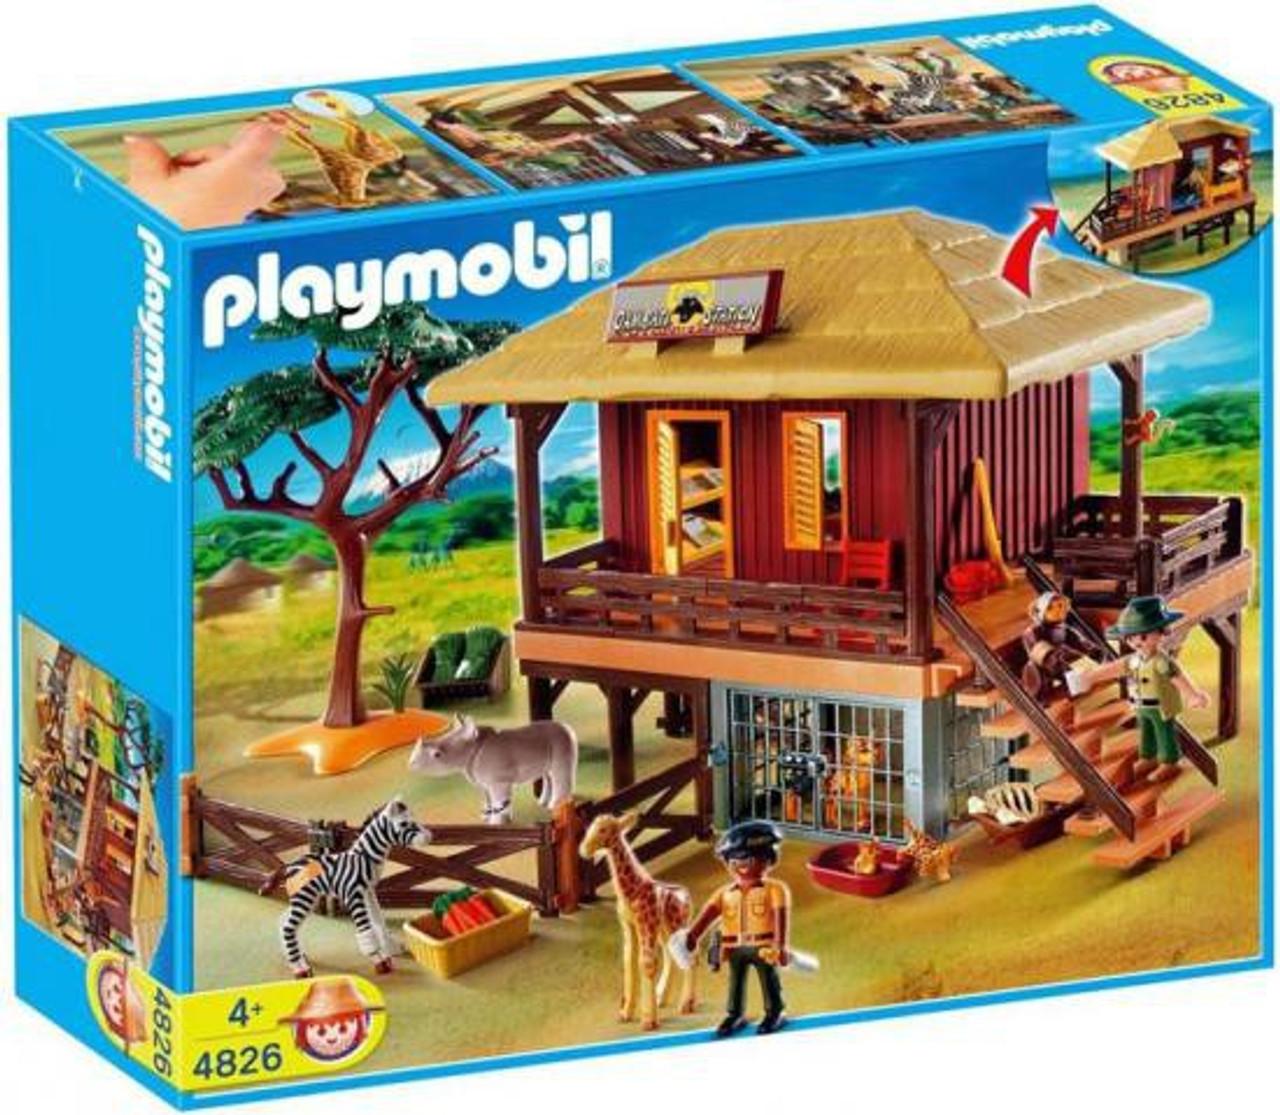 playmobil zoo animal clinic wild life care station set 4826 toywiz. Black Bedroom Furniture Sets. Home Design Ideas